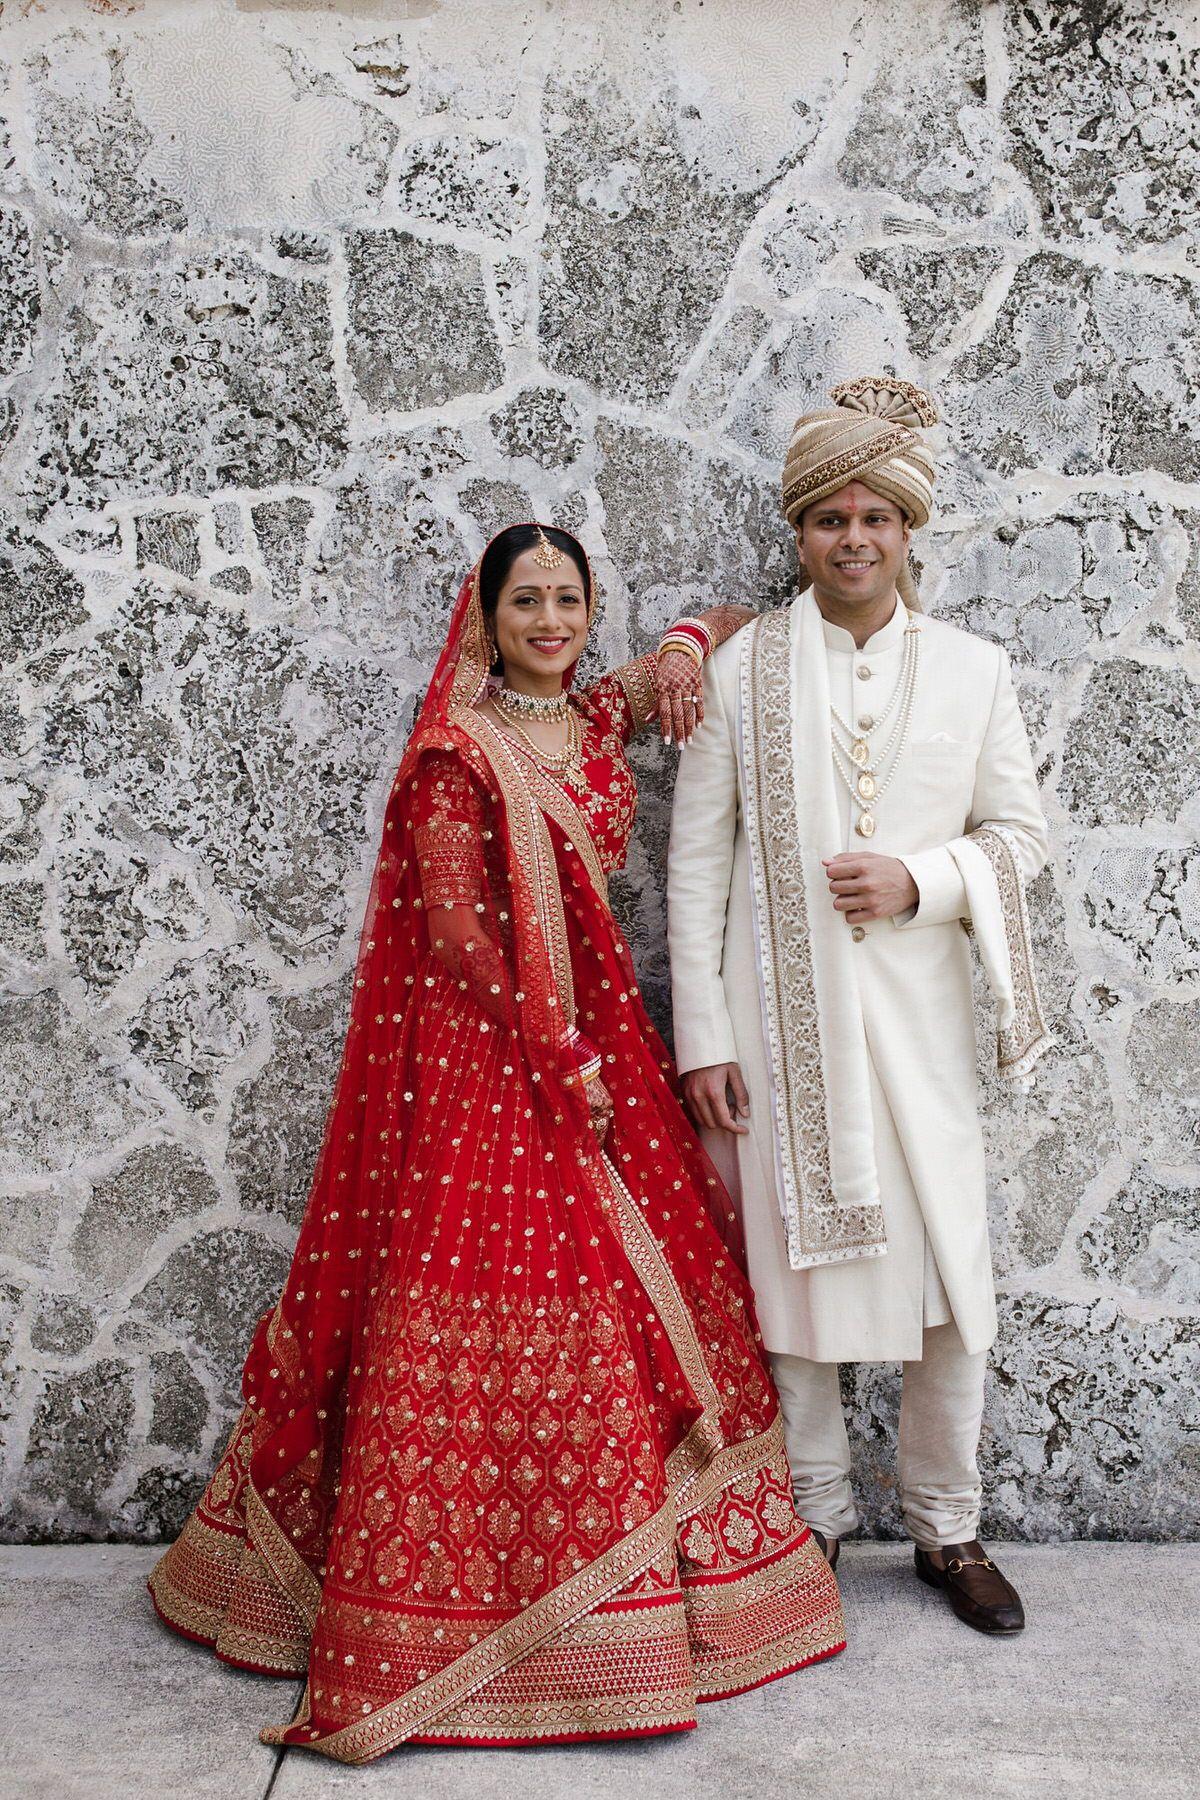 Coral gables country club wedding miami indian wedding